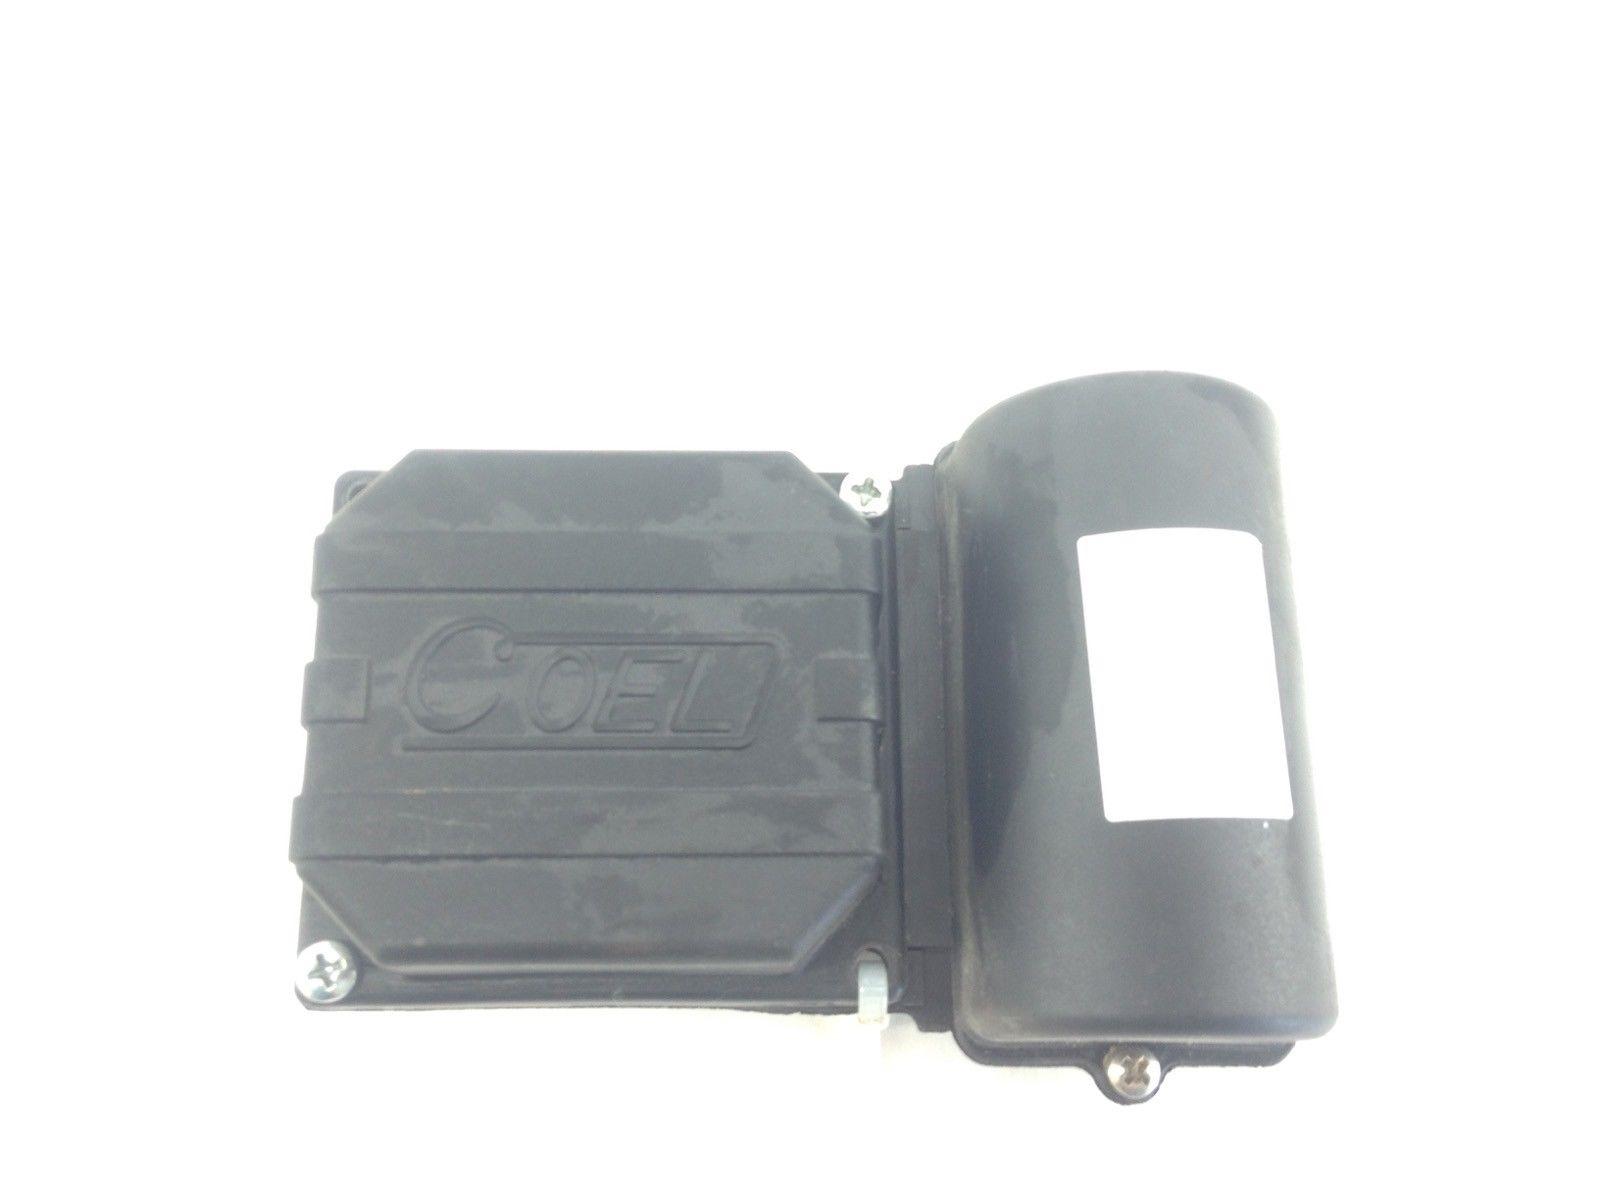 COEL BREVETTATO TERMINAL BOX with MECO CMI-4-634 ELECTRIC CAPACITOR (H3) 1